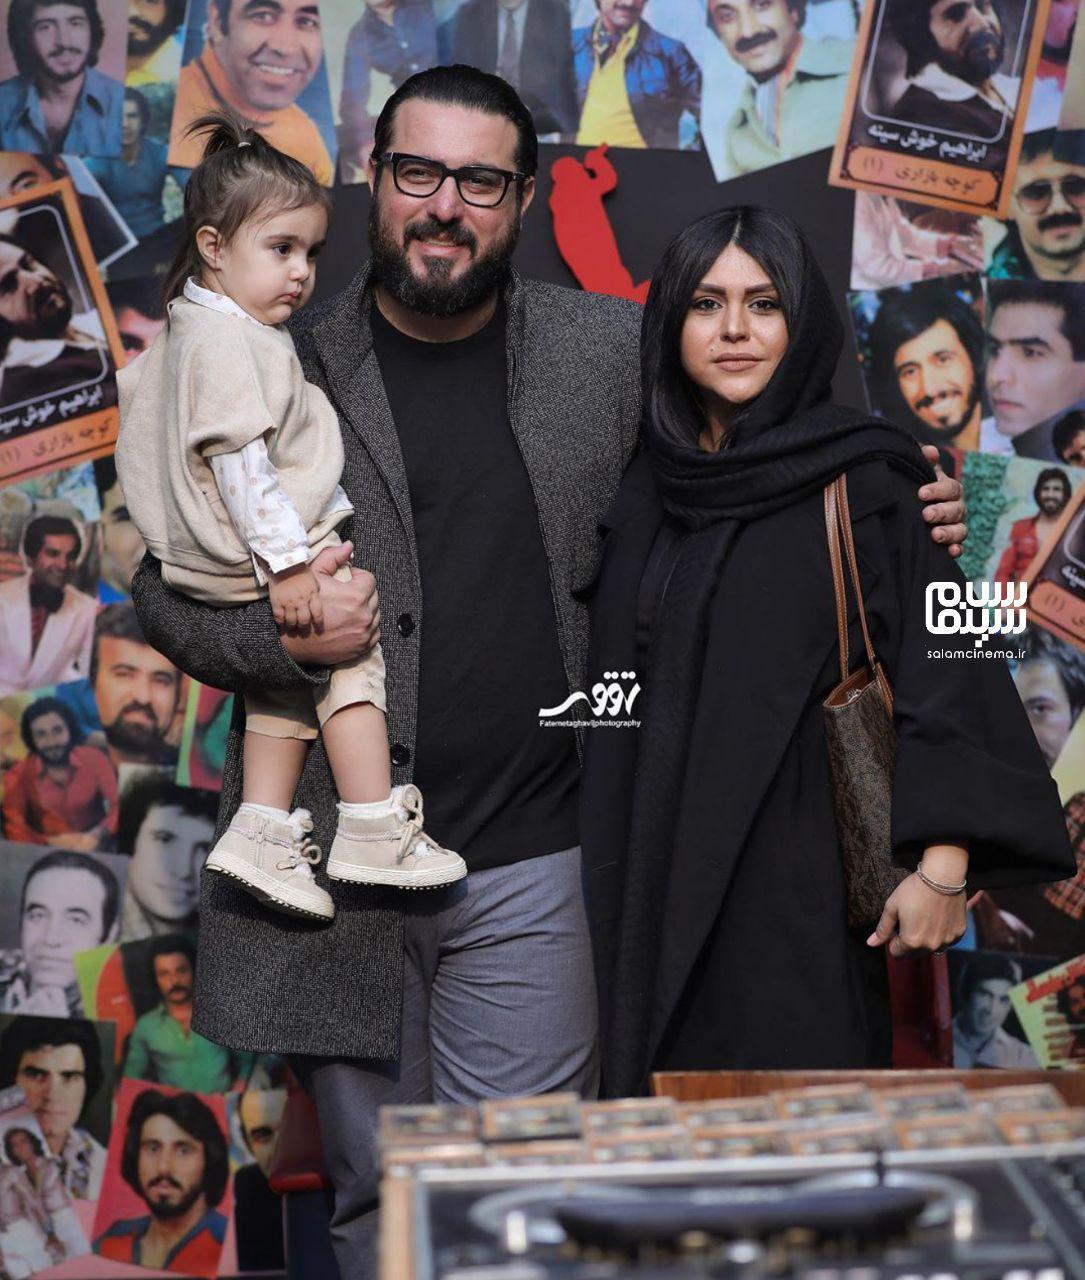 محسن کیایی و همسر و دخترش - اکران خصوصی فیلم مطرب - سینما چارسو